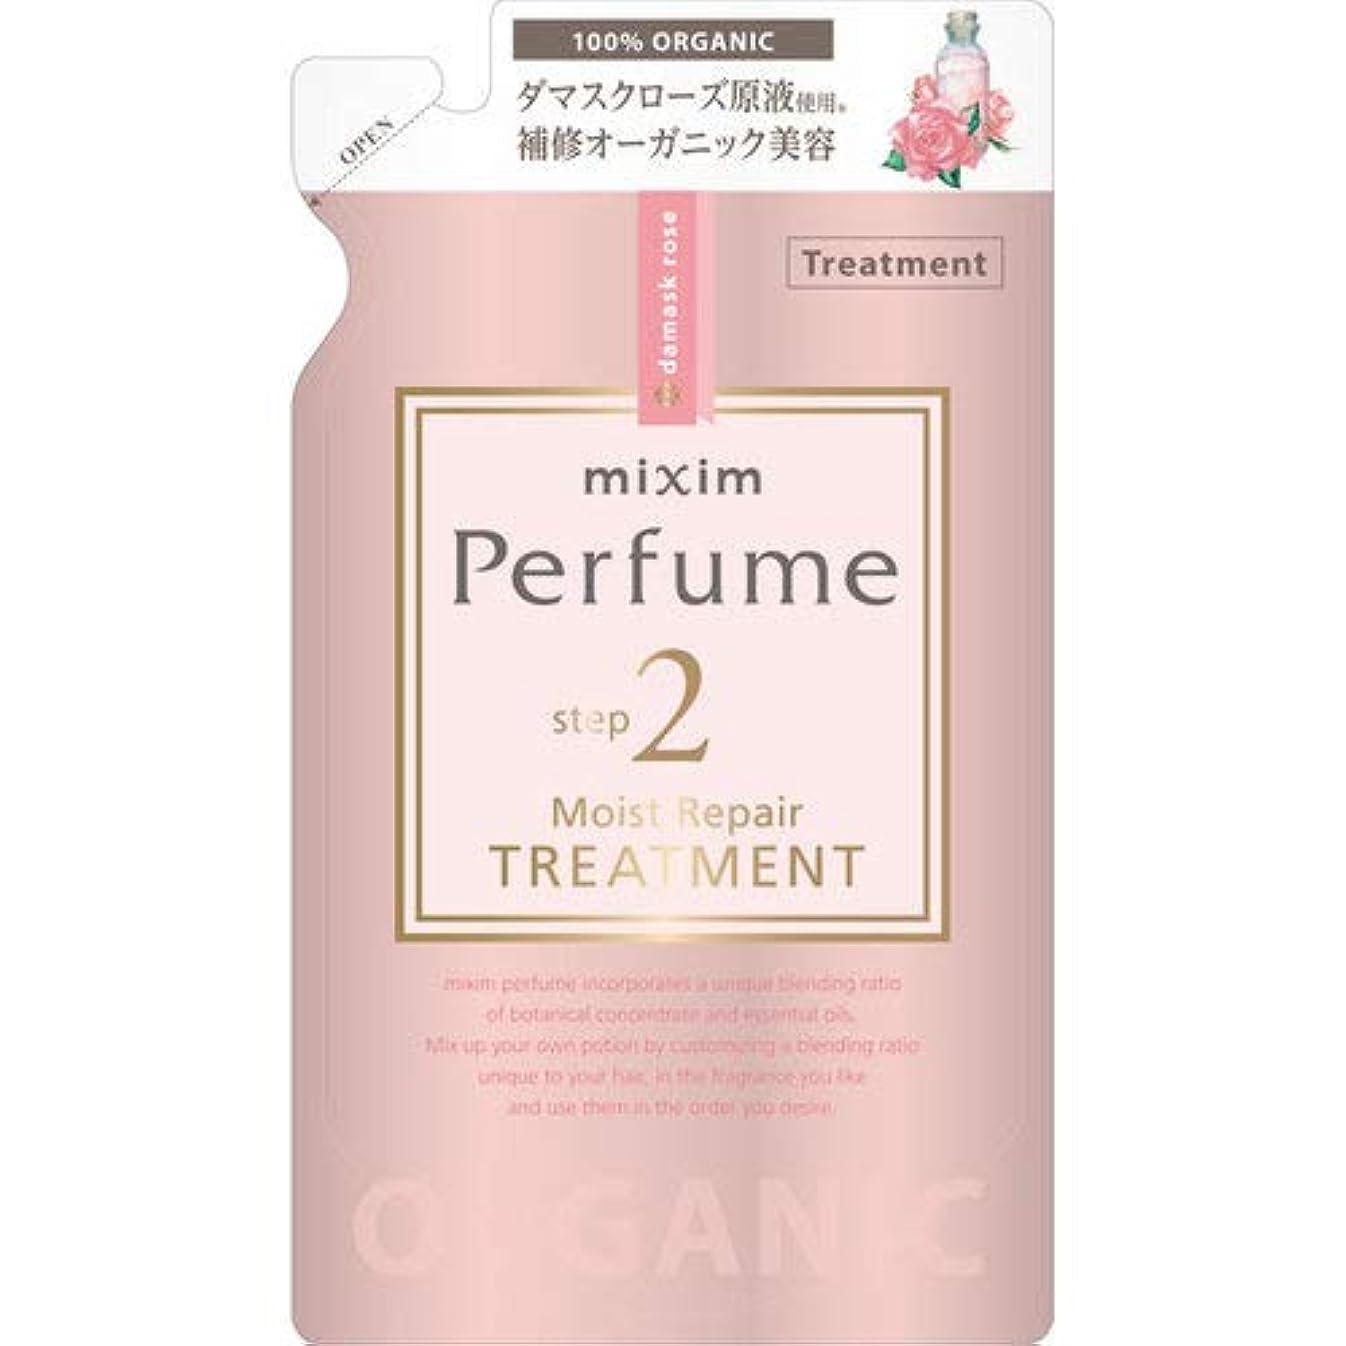 mixim Perfume(ミクシムパフューム) モイストリペア ヘアトリートメントつめかえ用 350g